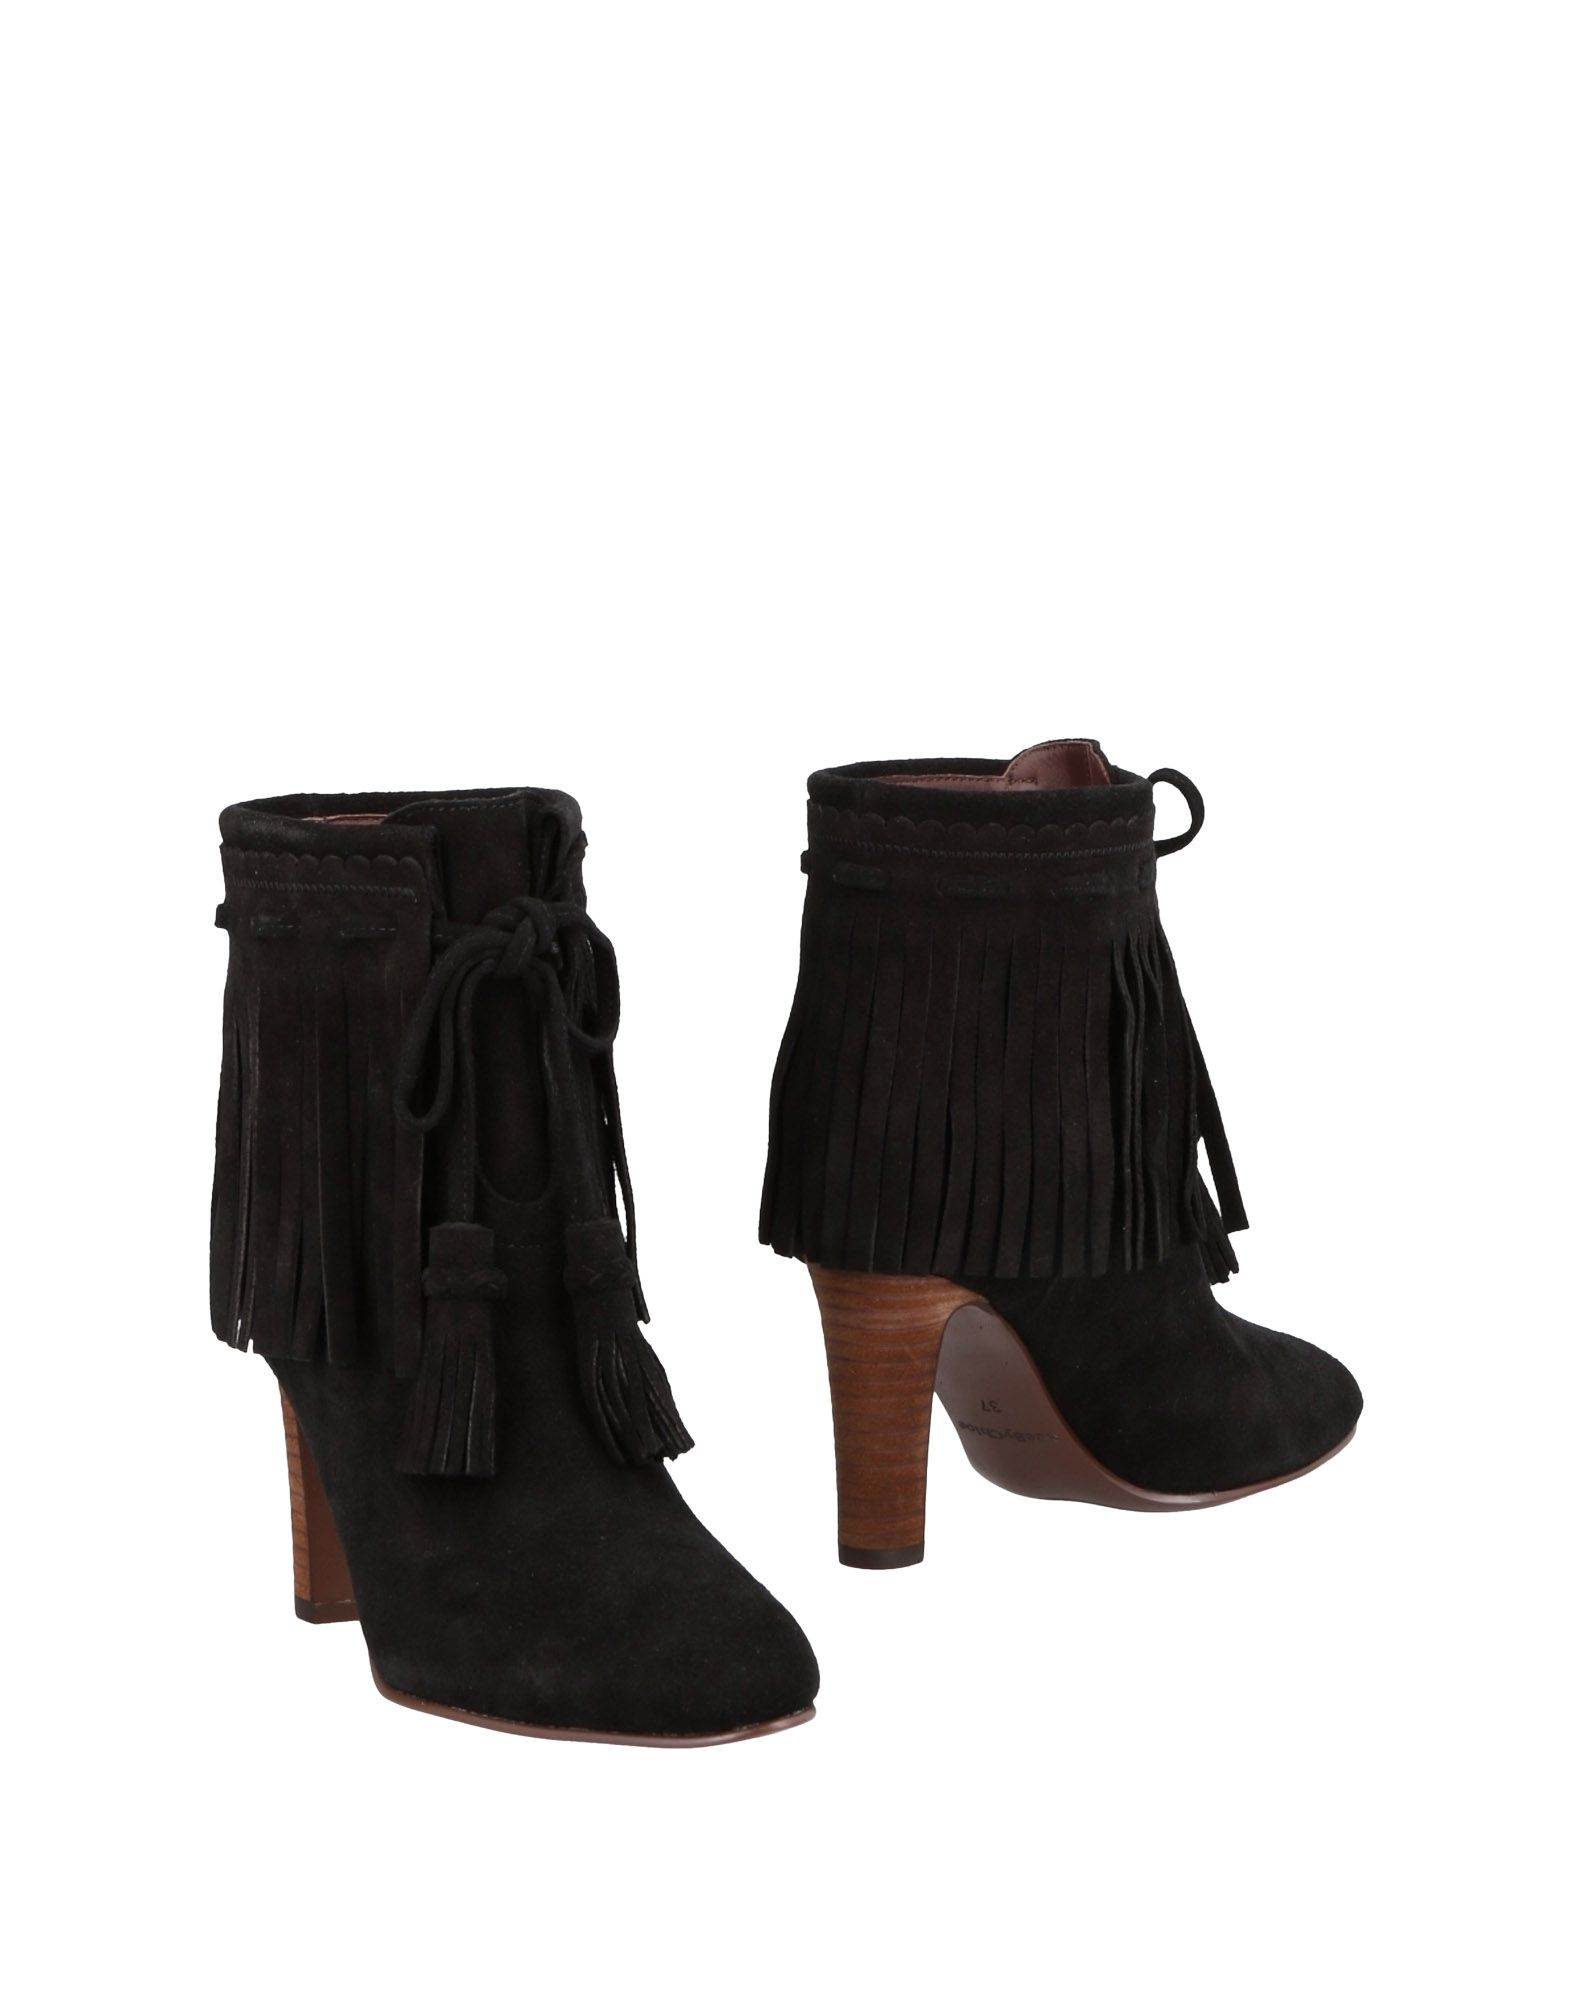 Rabatt Chloé Schuhe See By Chloé Rabatt Stiefelette Damen  11483552CW d82b3f